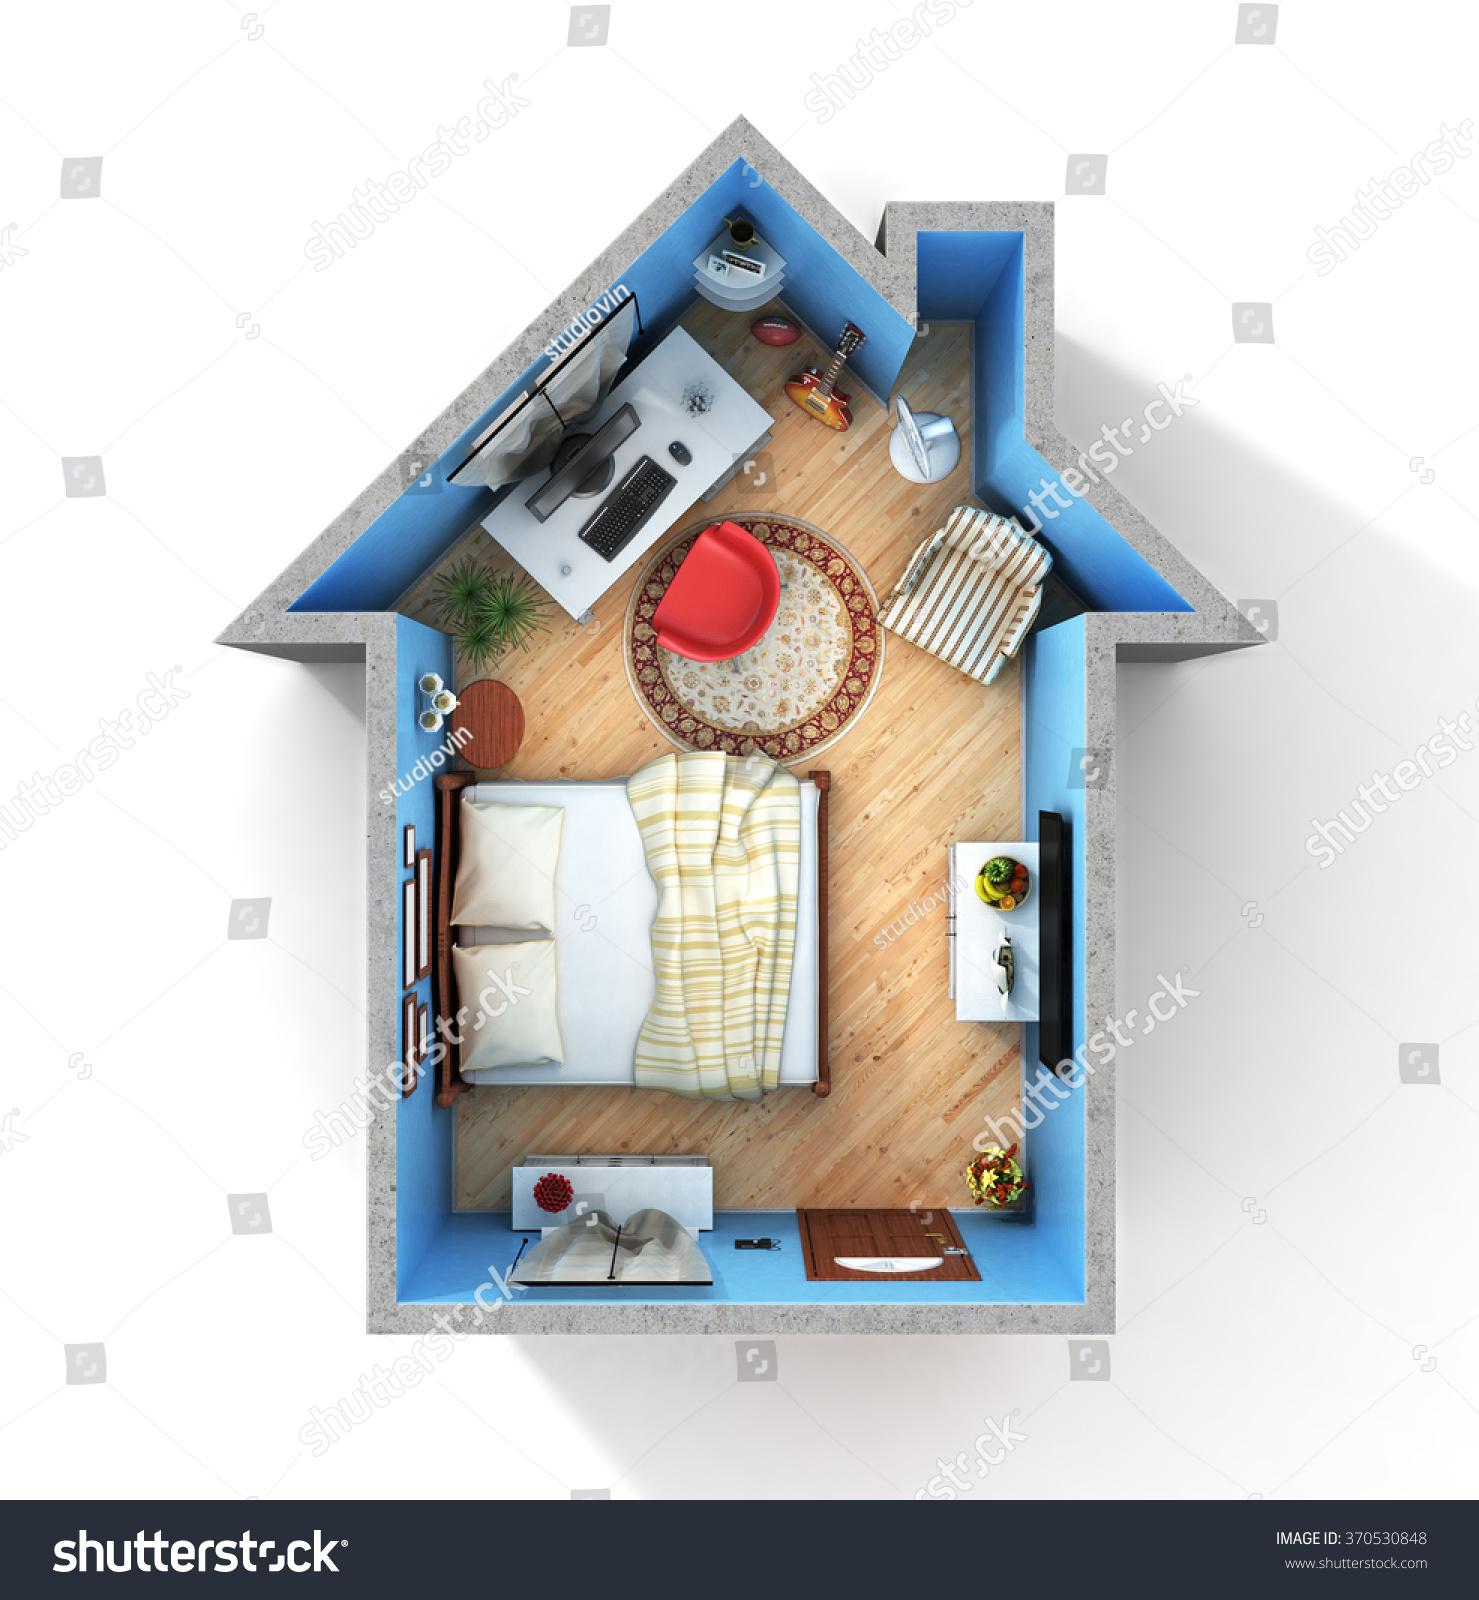 concept home flat full things form stock illustration 370530848 shutterstock. Black Bedroom Furniture Sets. Home Design Ideas